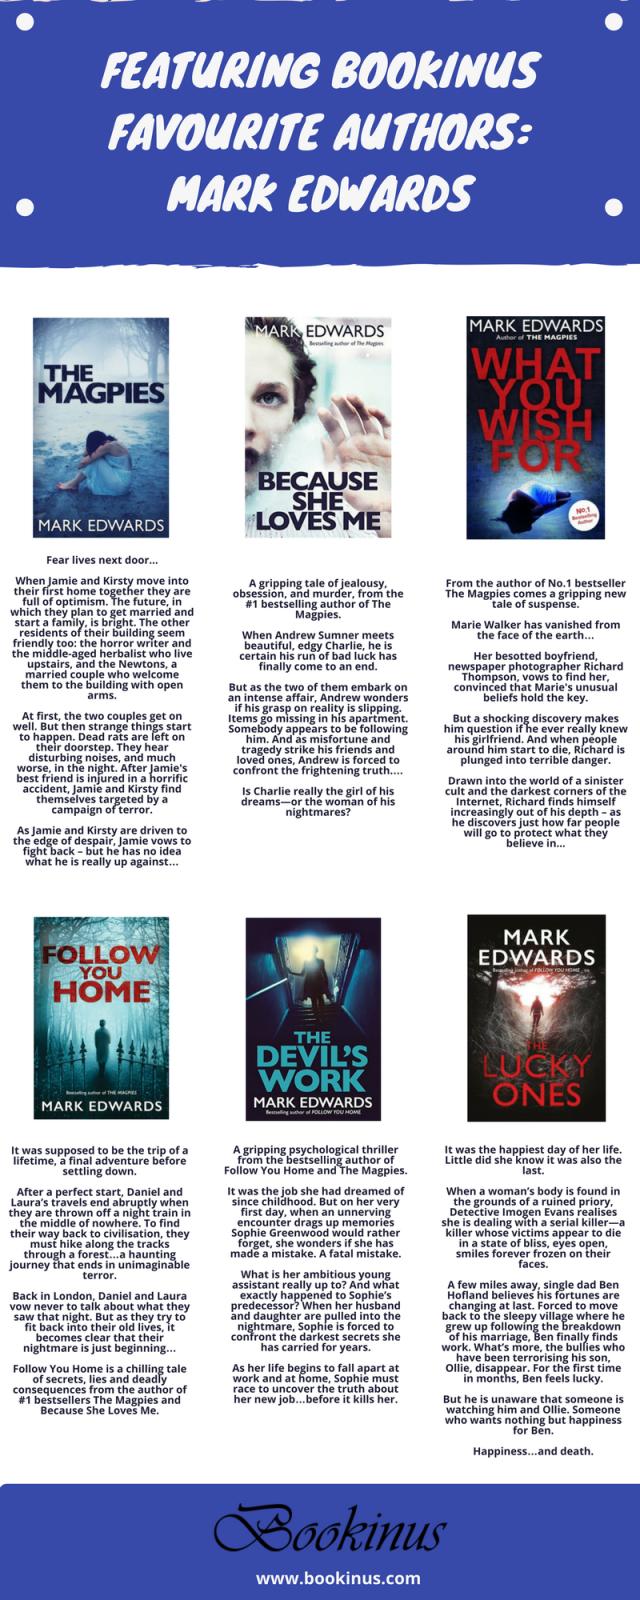 Featuring Bookinus favourite authors_ Mark Edwards